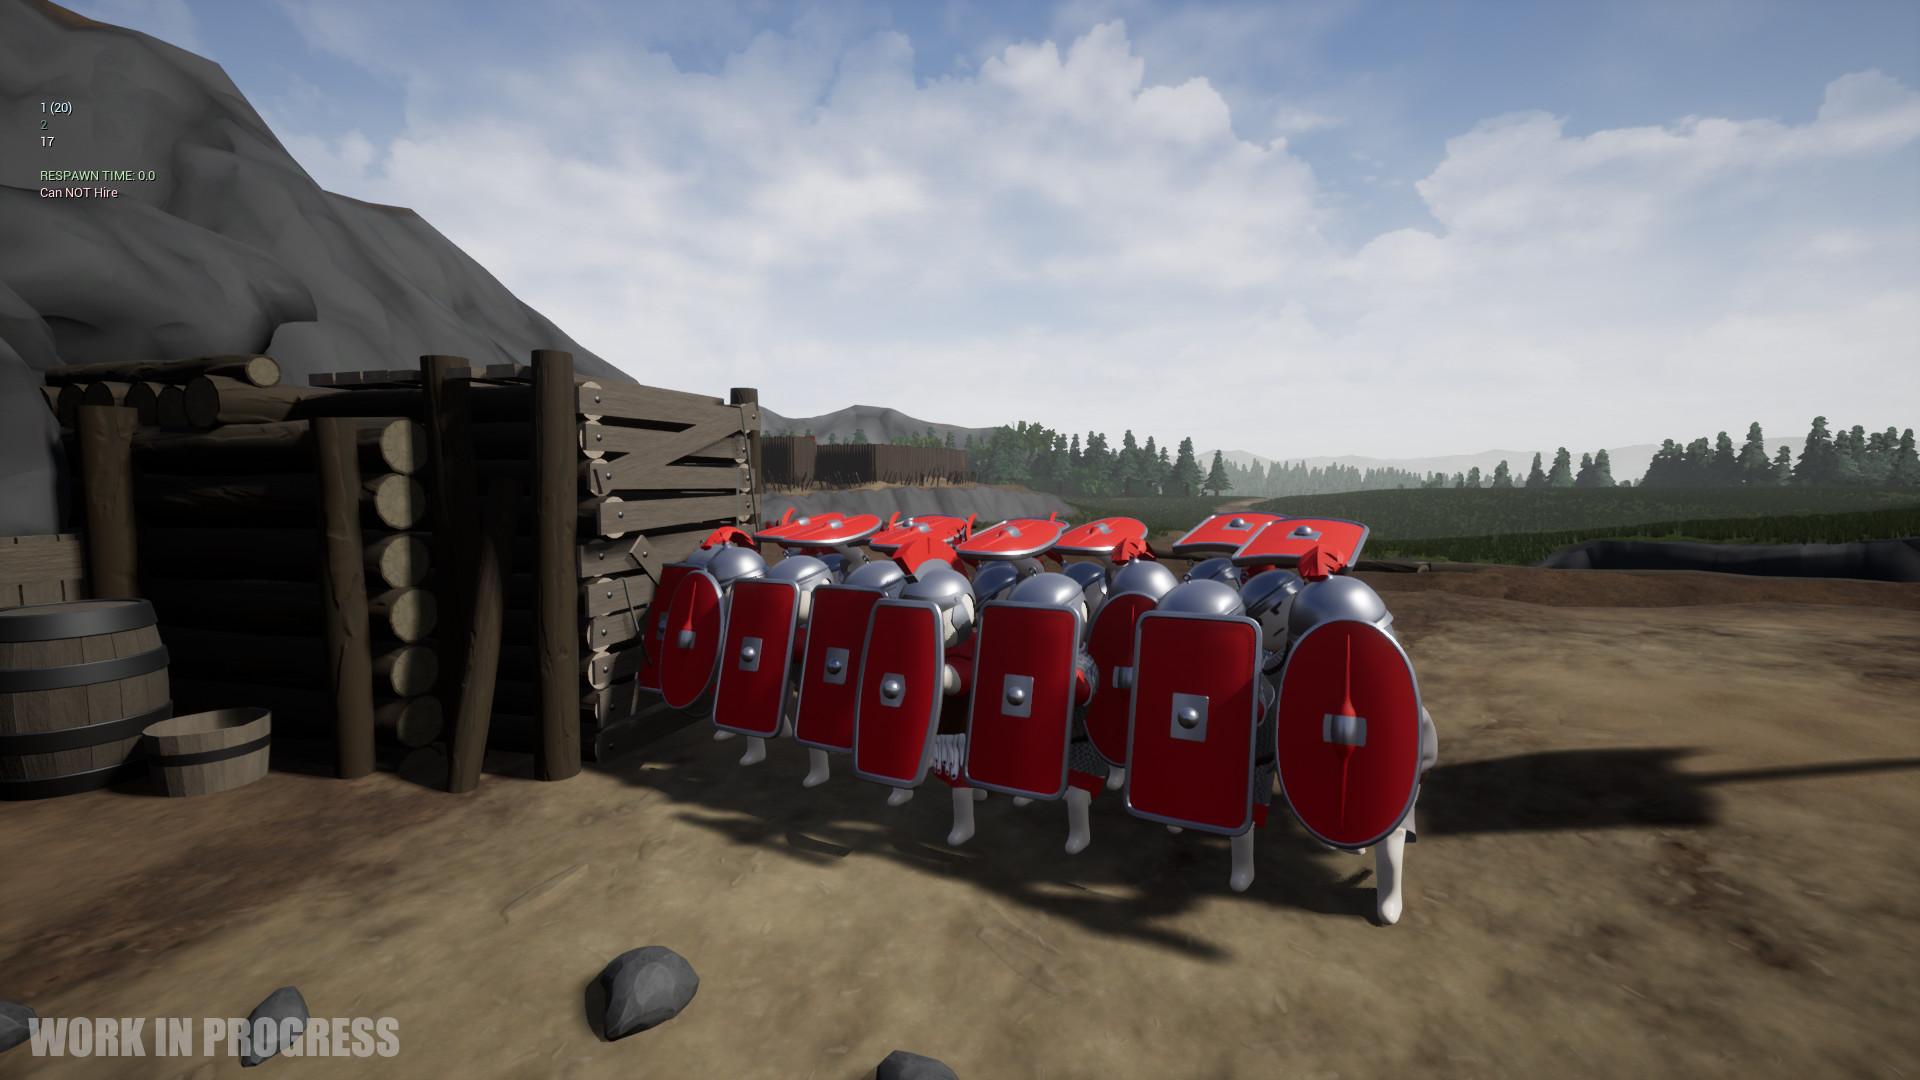 Shieldwall screenshot